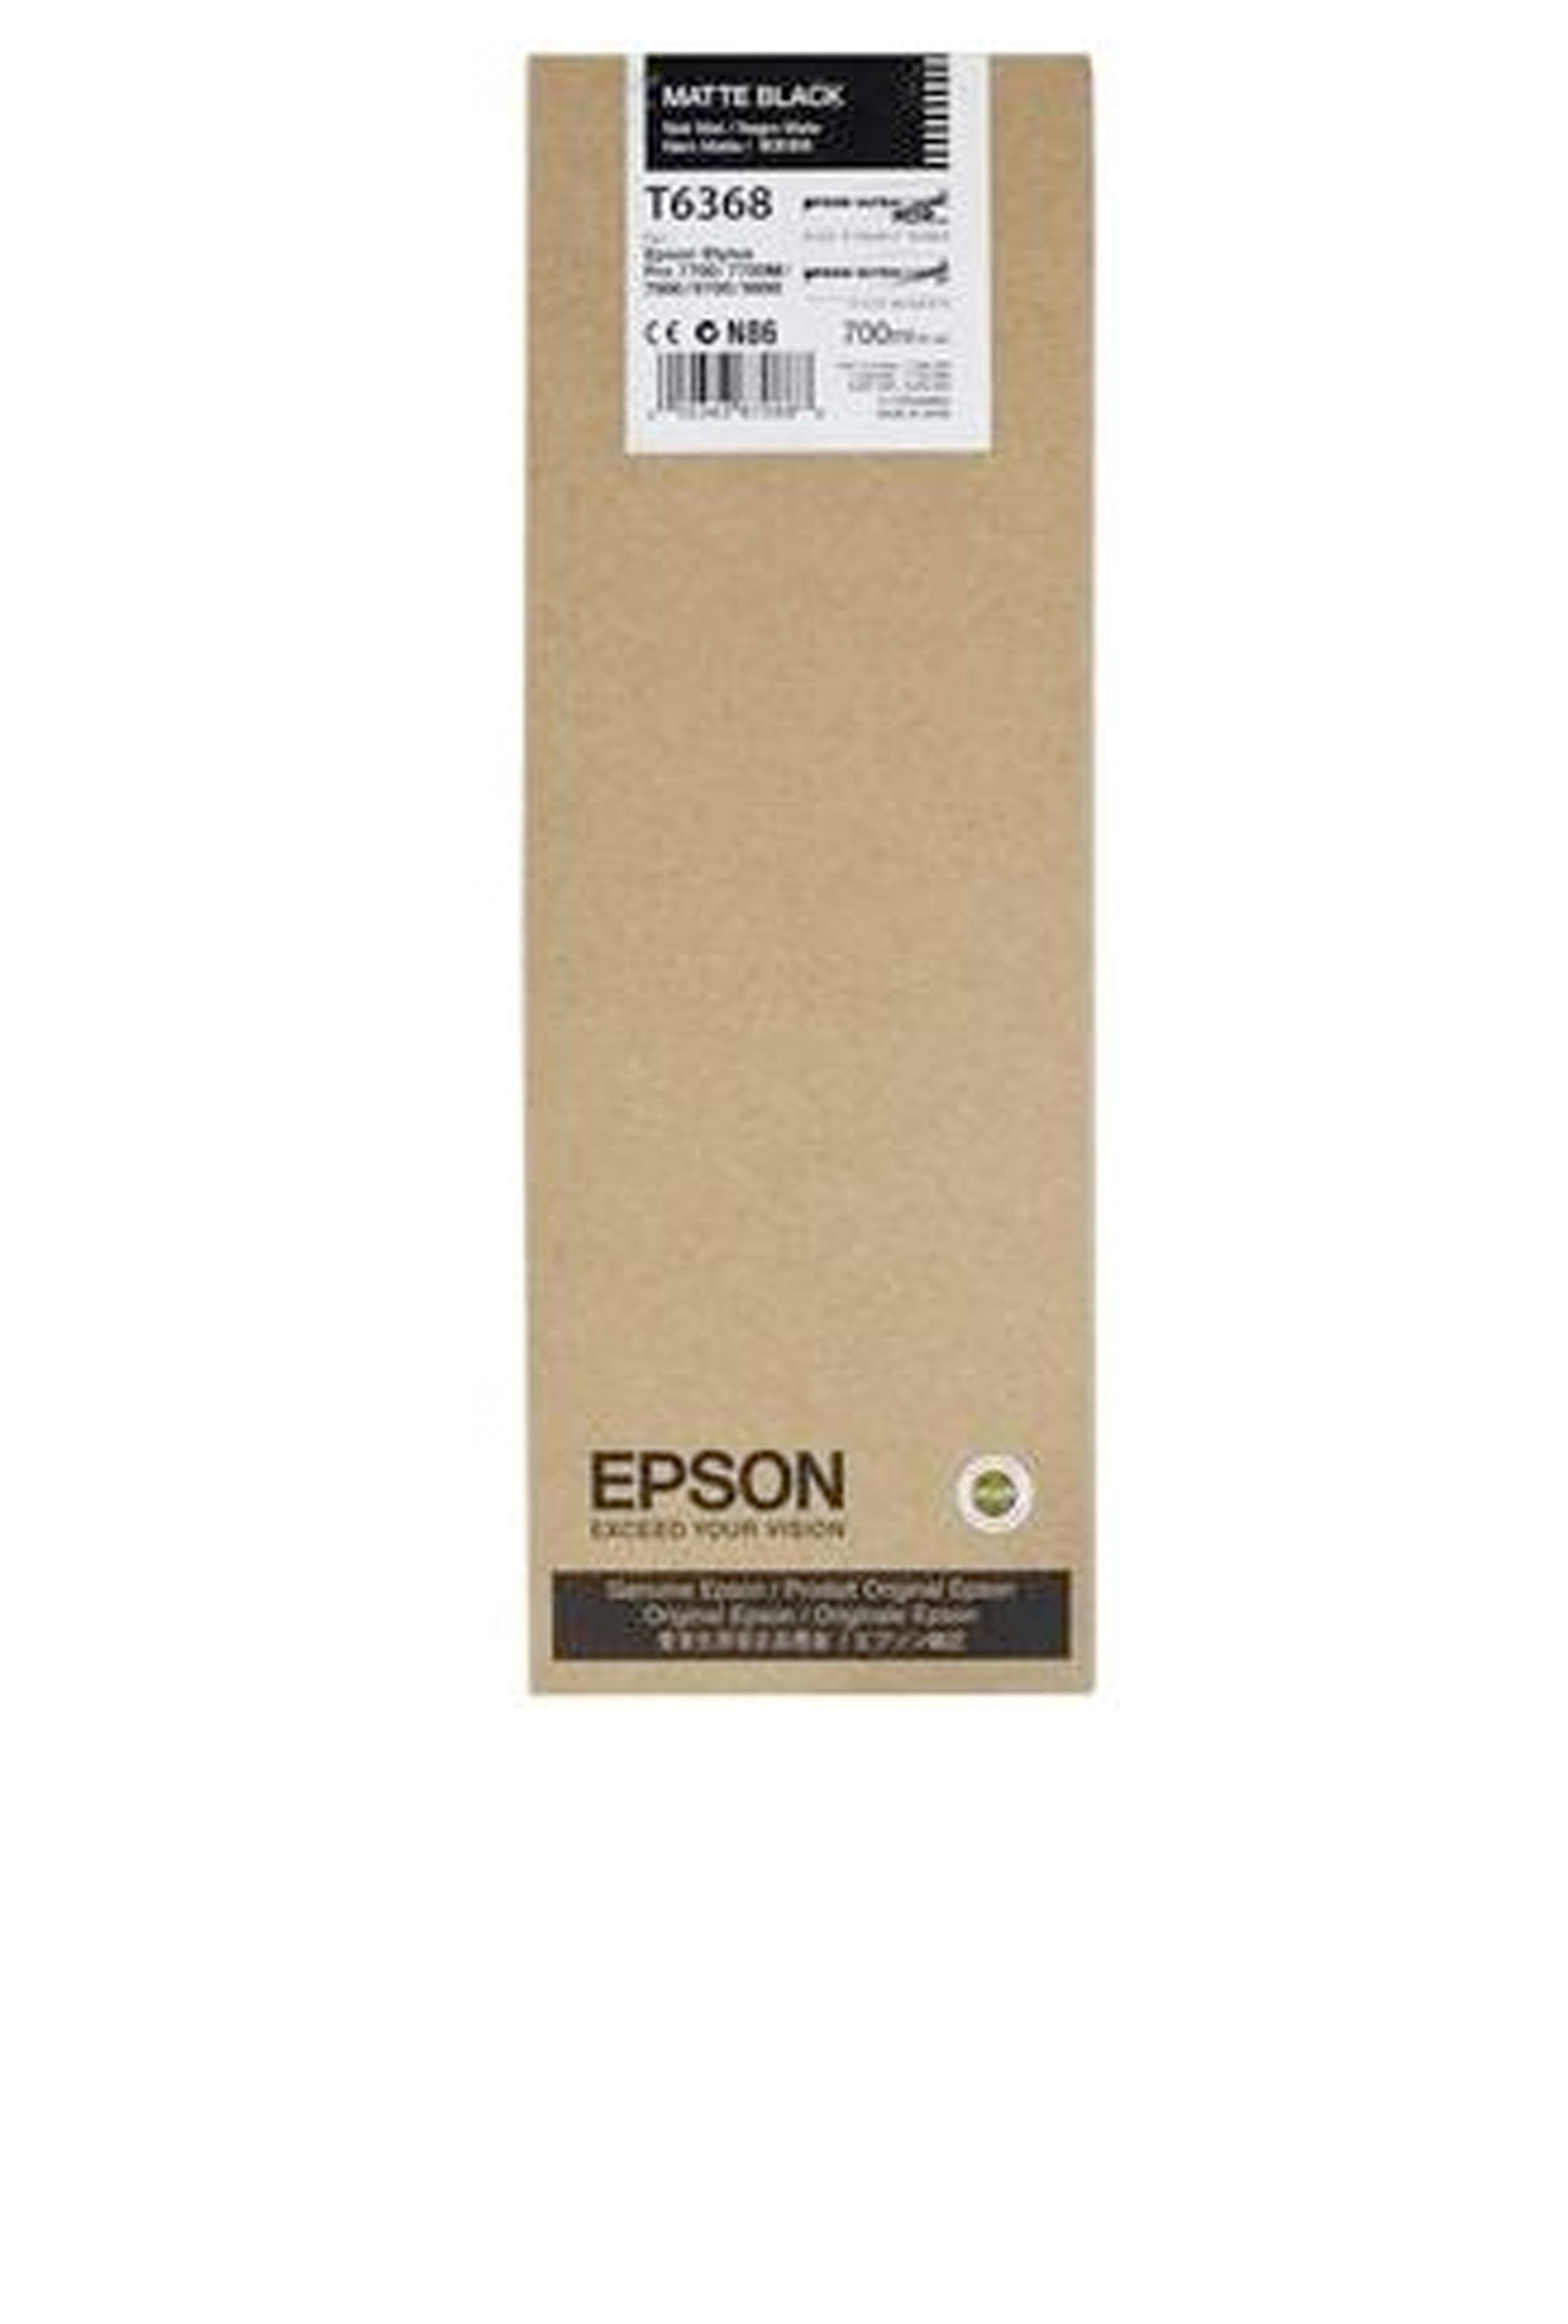 Epson EPSON HI MATTE BLACK INK (700 ML) (T636800)